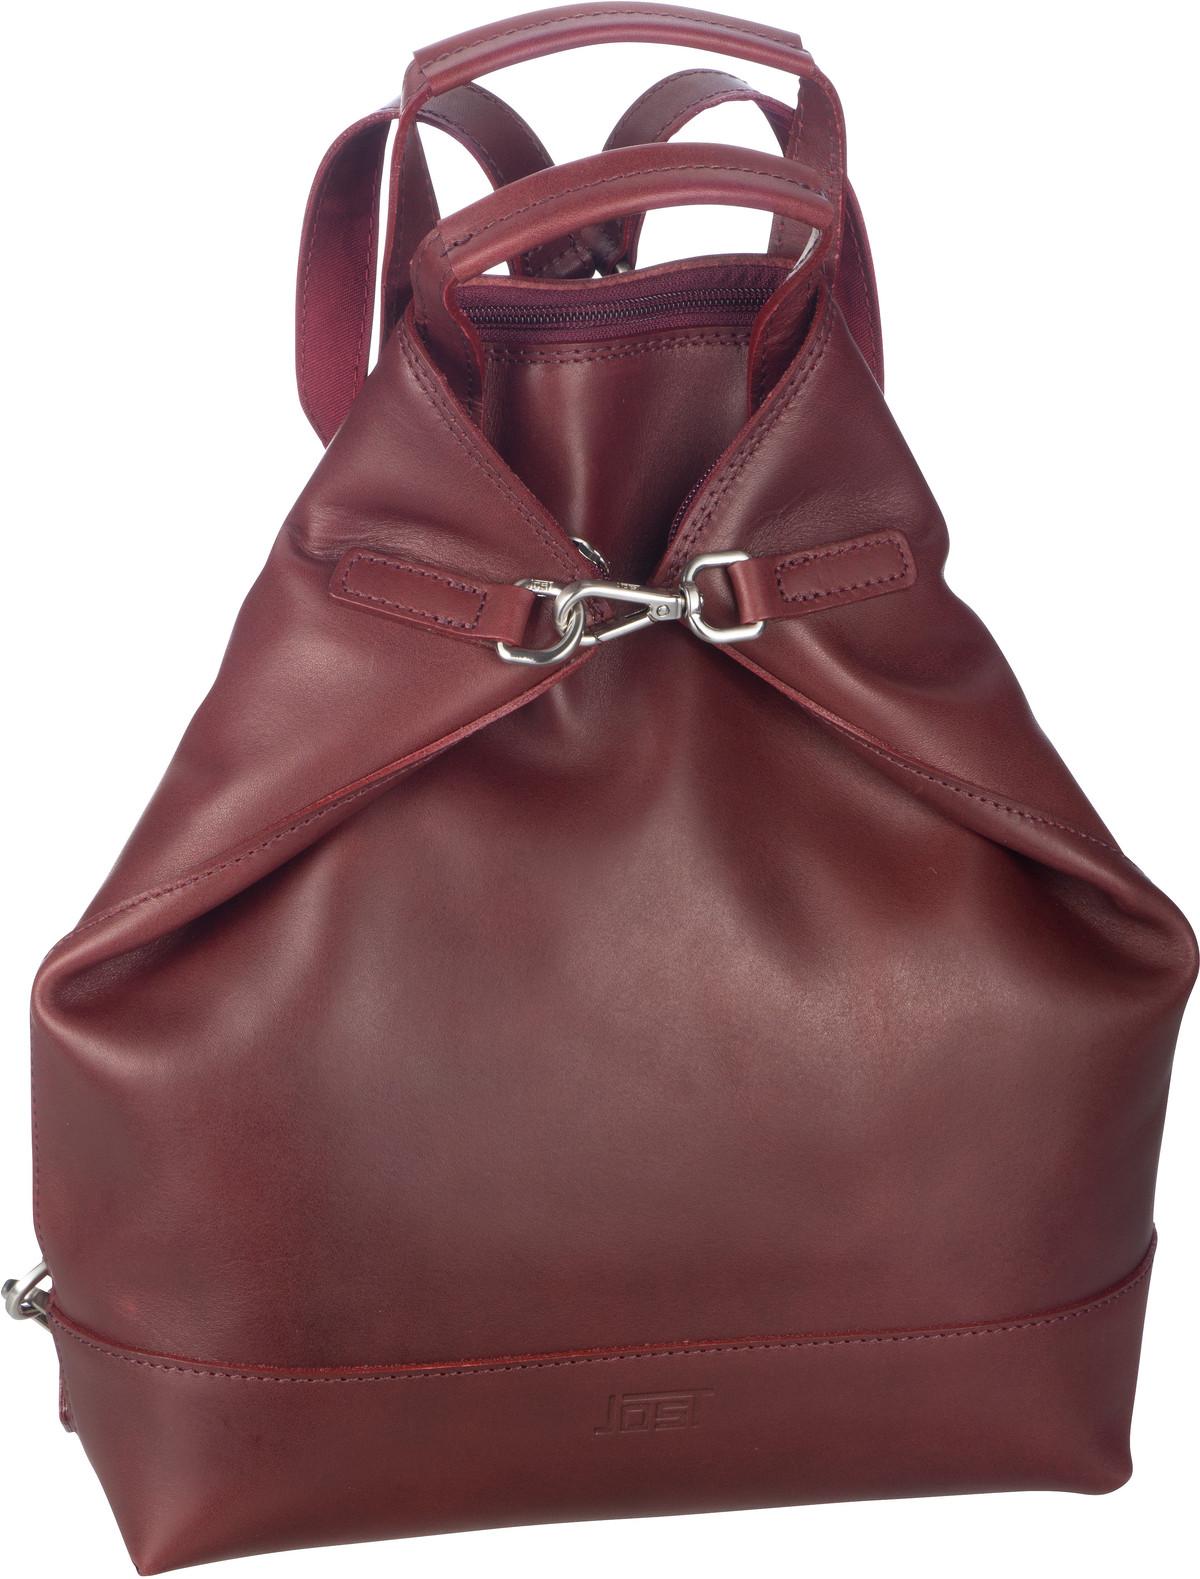 Rucksack / Daypack Rana 1206 X-Change Bag XS Bordeaux